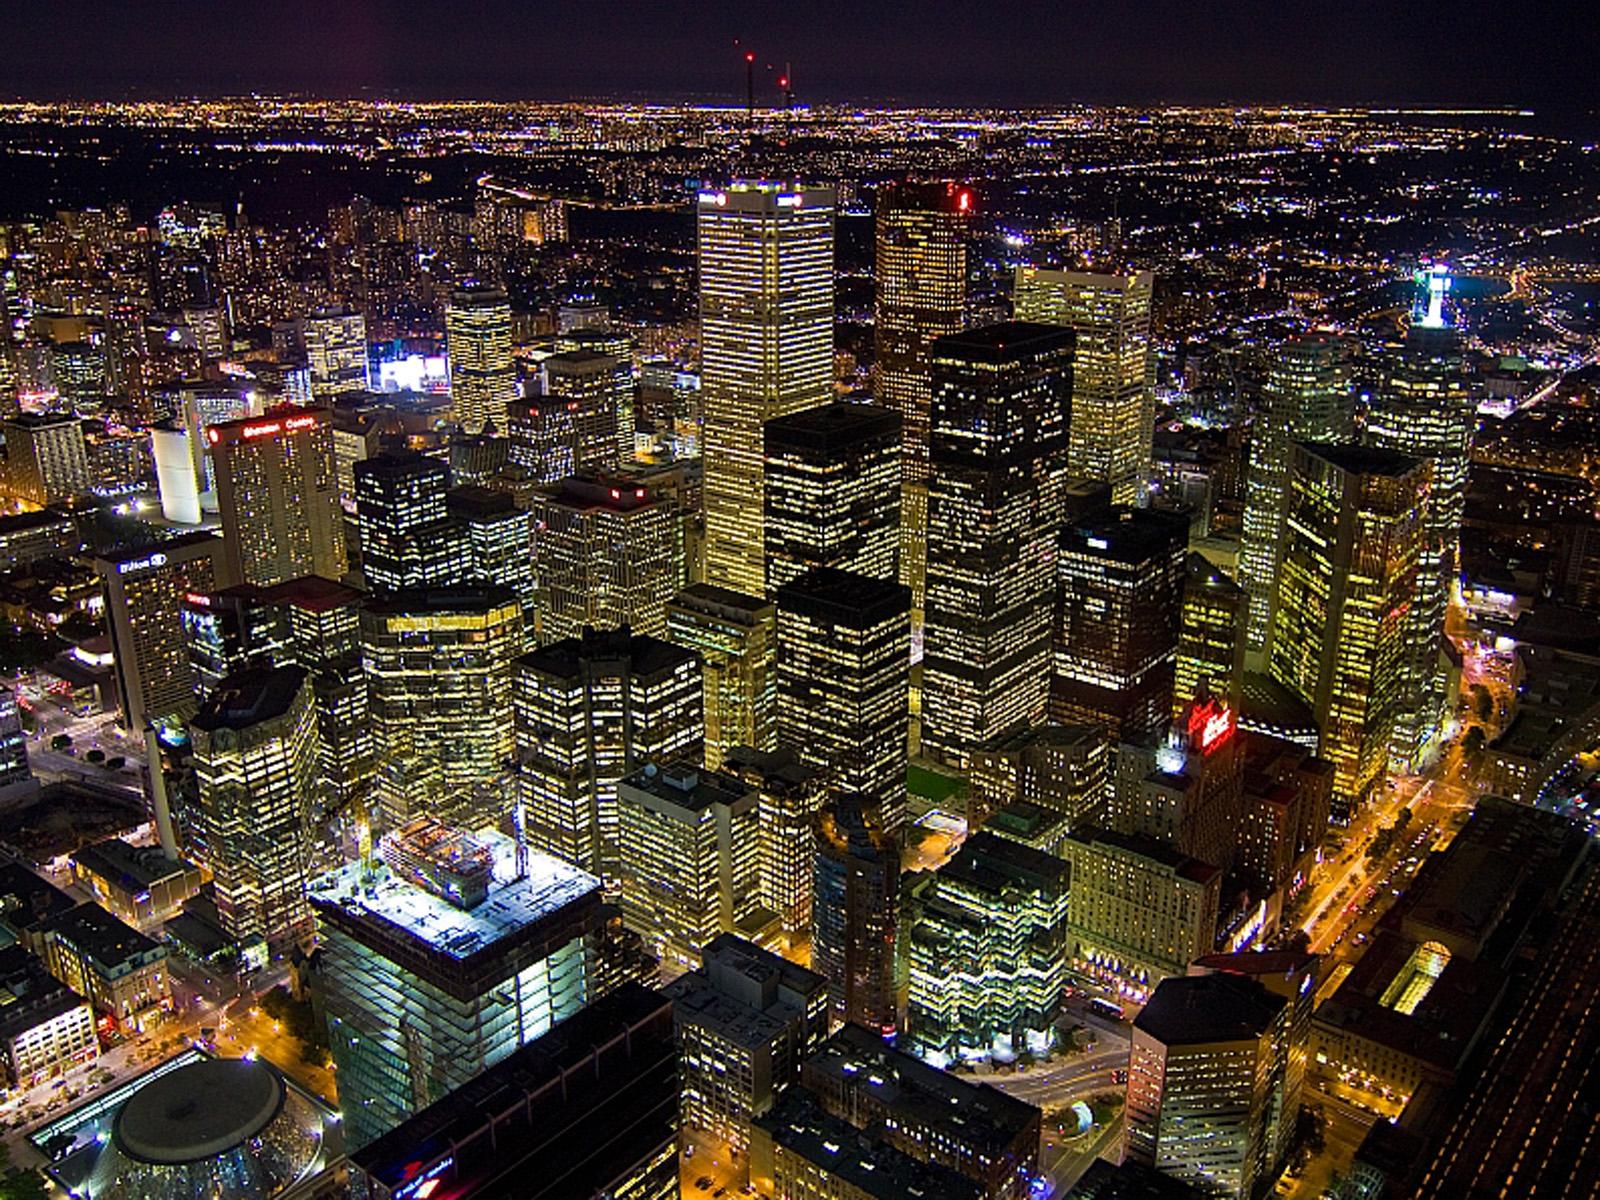 Social Media Marketing, Sales and Marketing, N5R, Condo Marketing, Condo Sales, Increase Condo Sales, Social Selling, Real Estate Marketing, Toronto Marketing agency, Roman Bodnarchuk, Luxury Condo Hotels, Toronto Luxury Condos, Toronto Real Estate, N5R